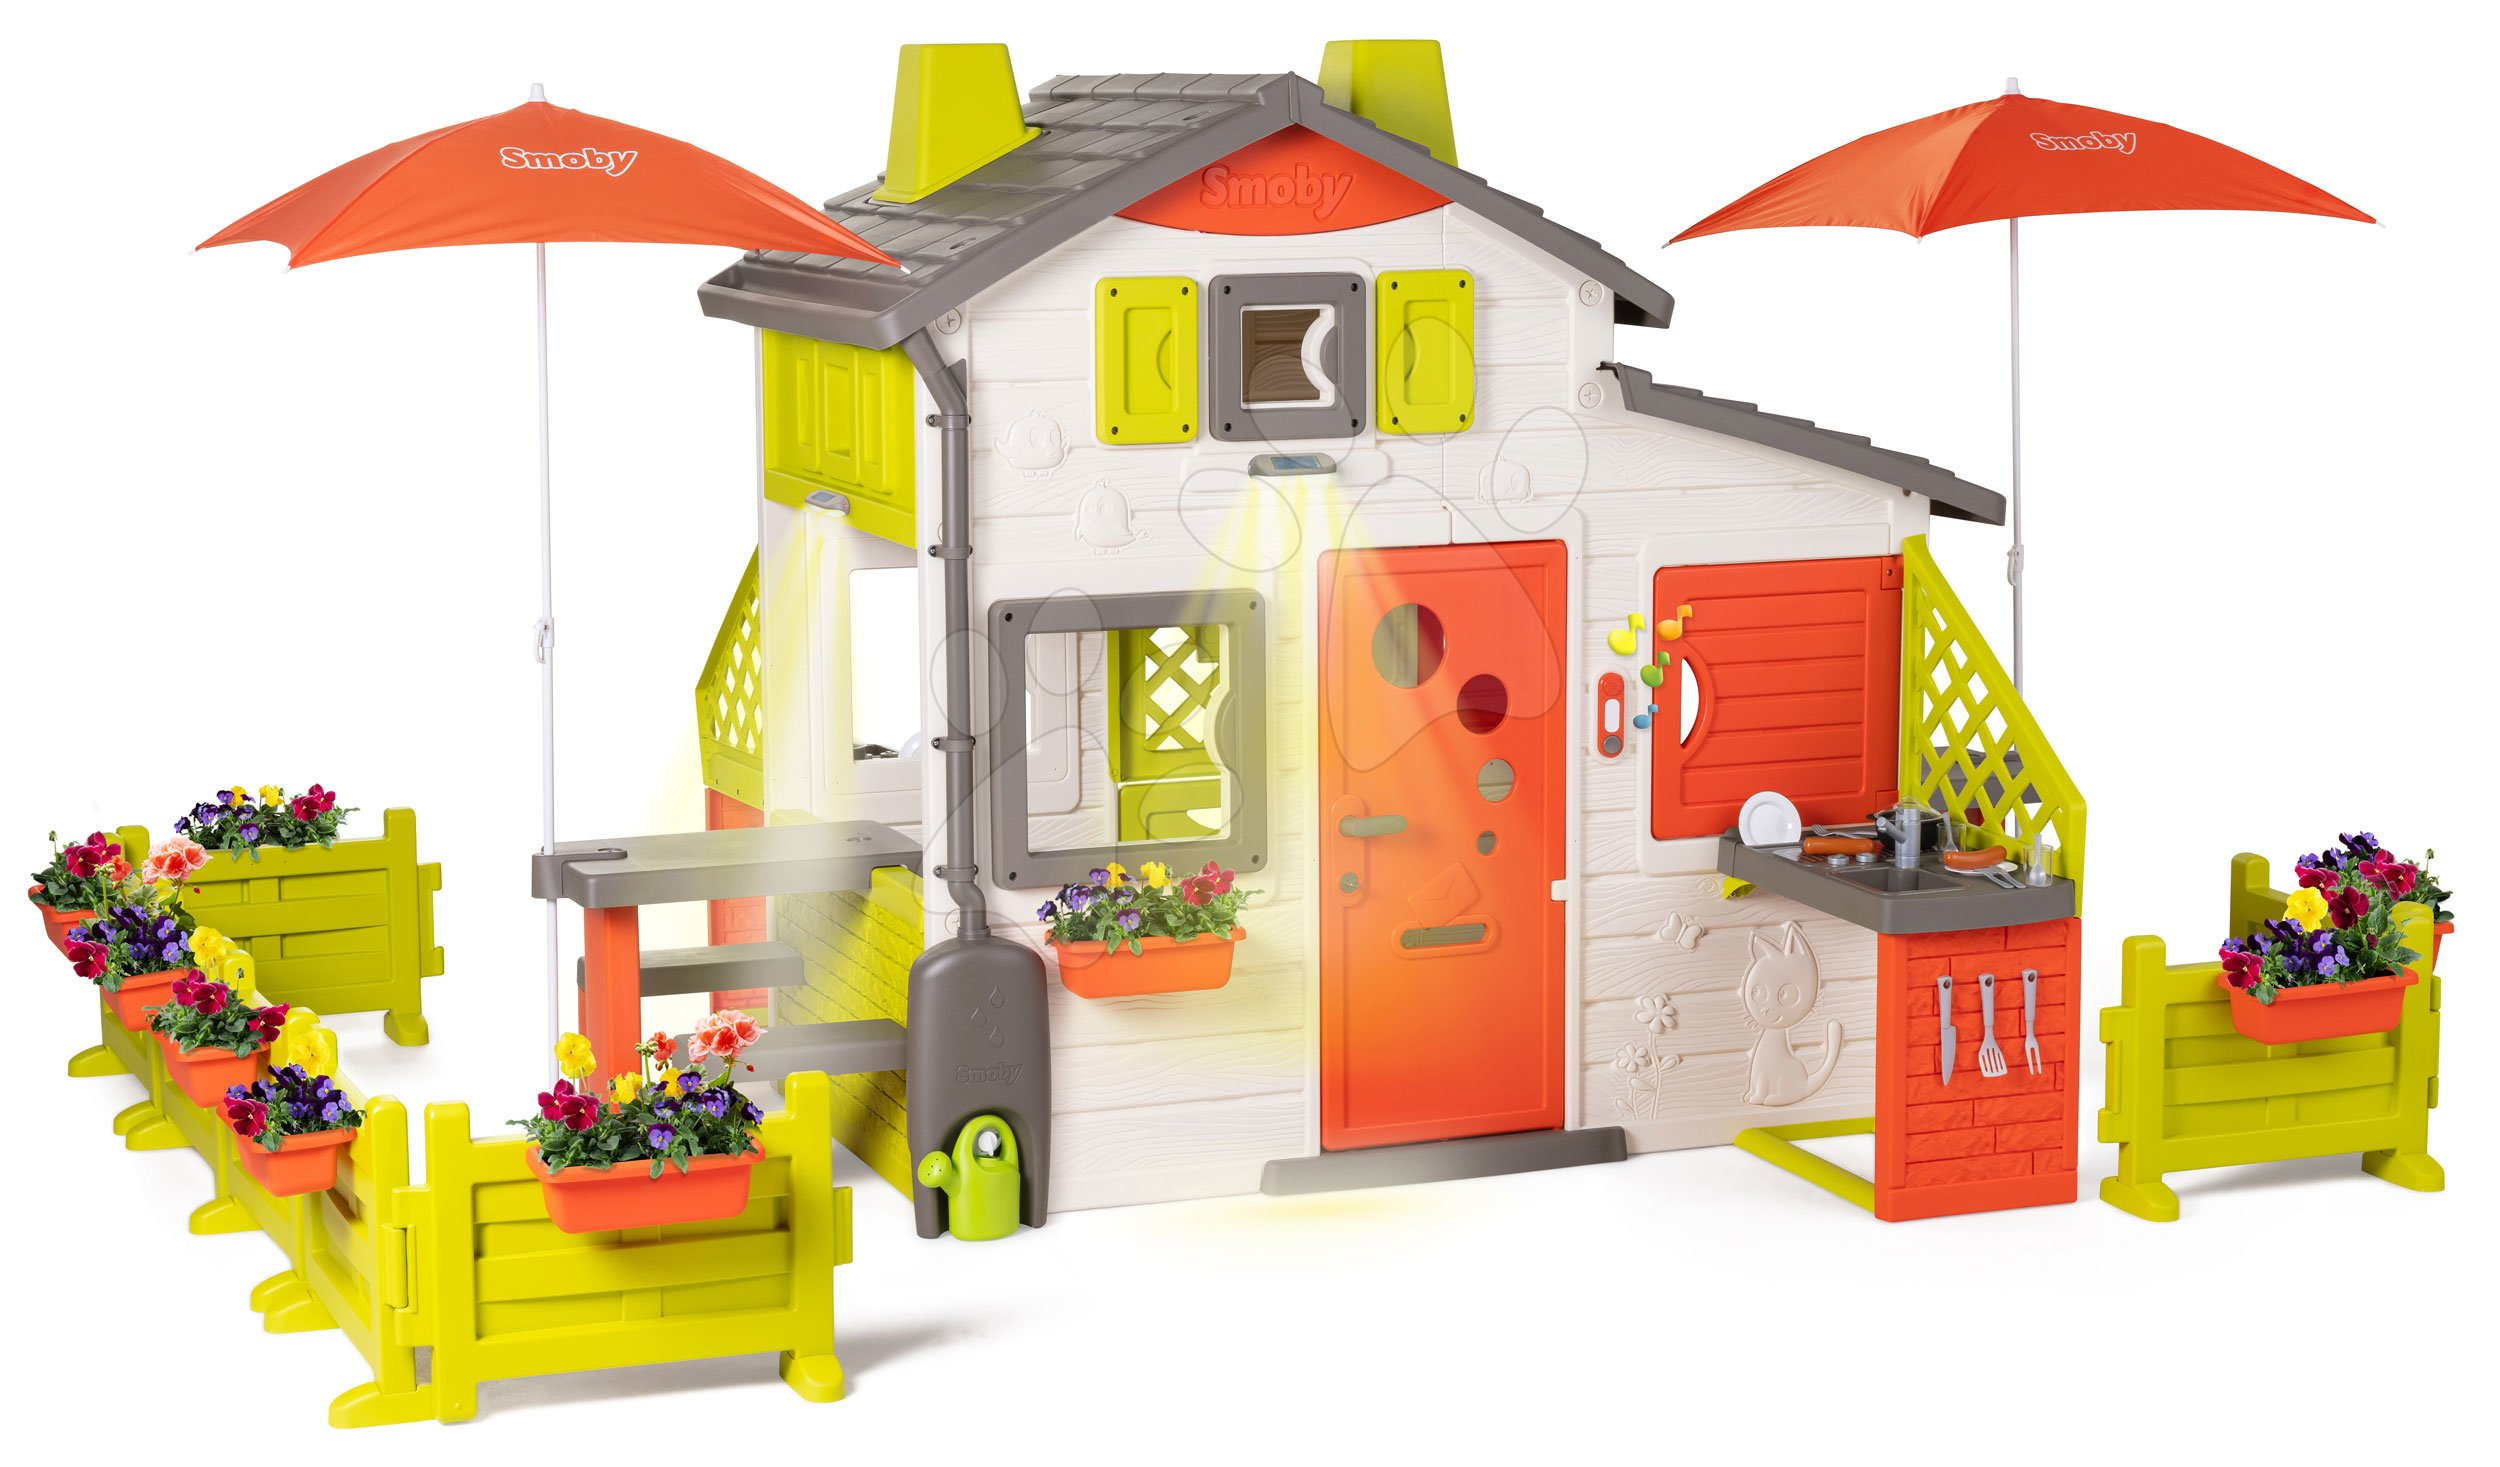 Domček Neo Friends House DeLuxe Smoby s dvoma kuchynkami a stolíkmi so slnečníkom s oplotením